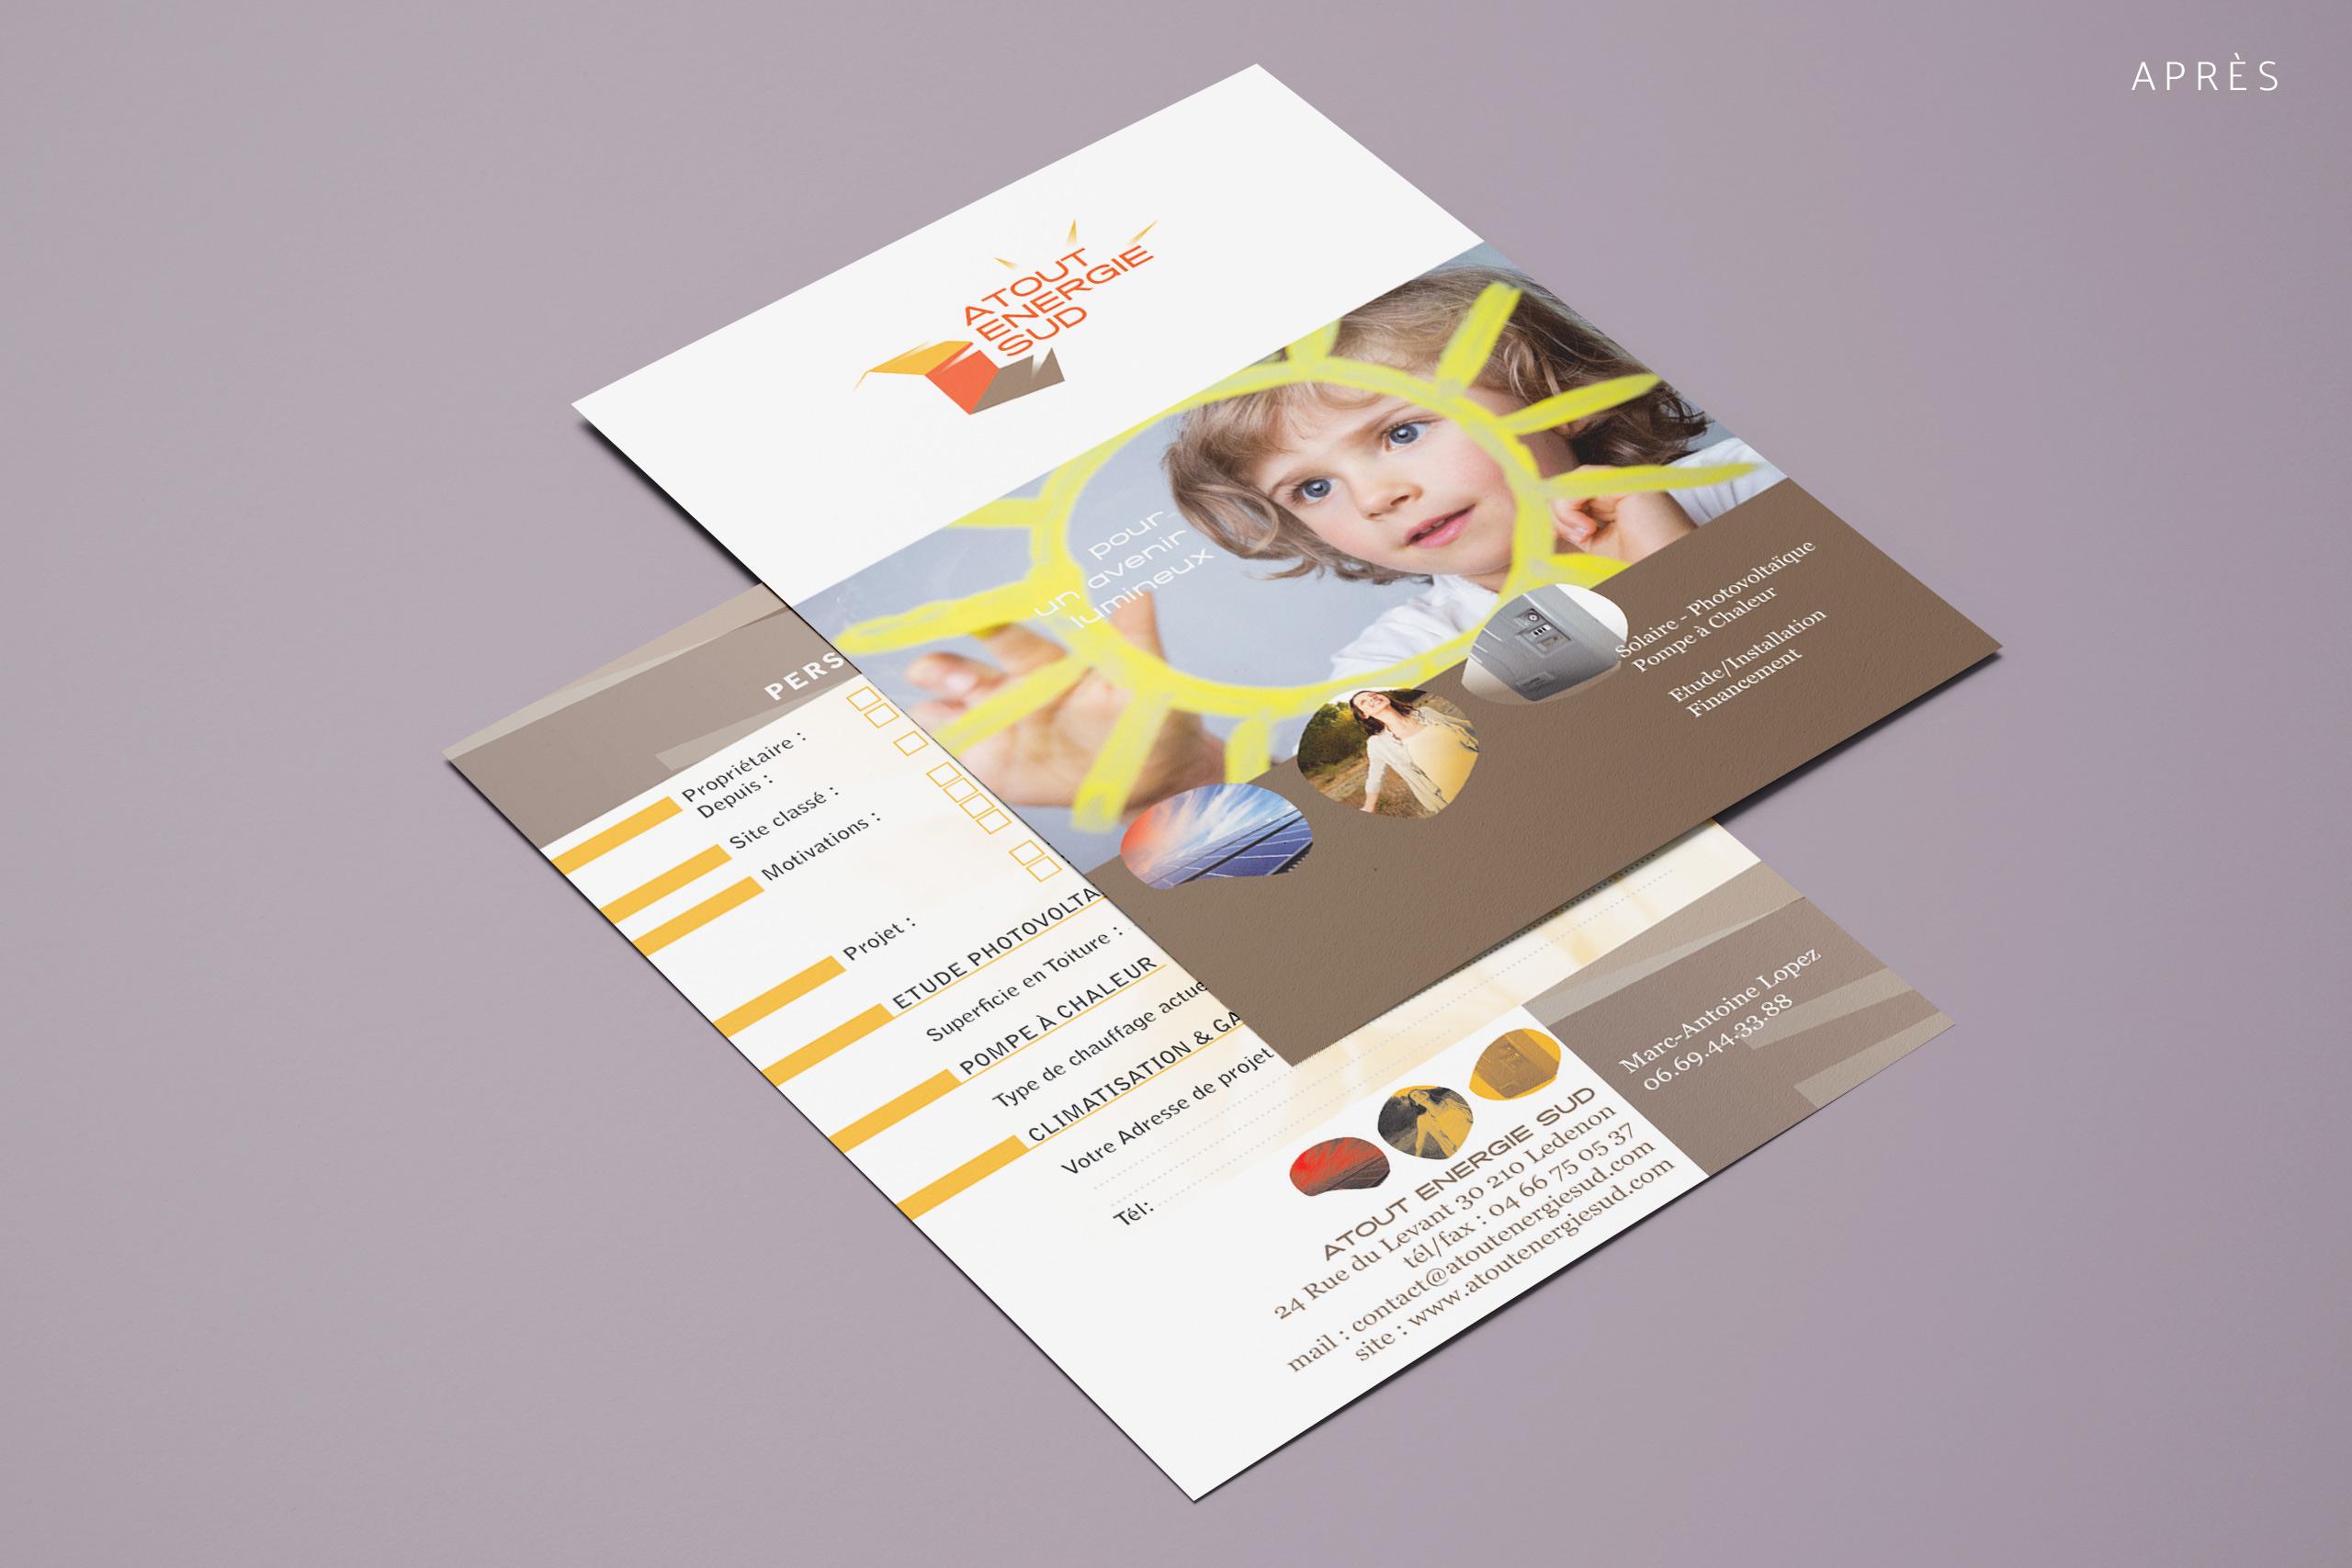 energie-solaire-apres-agence-communication-nimes